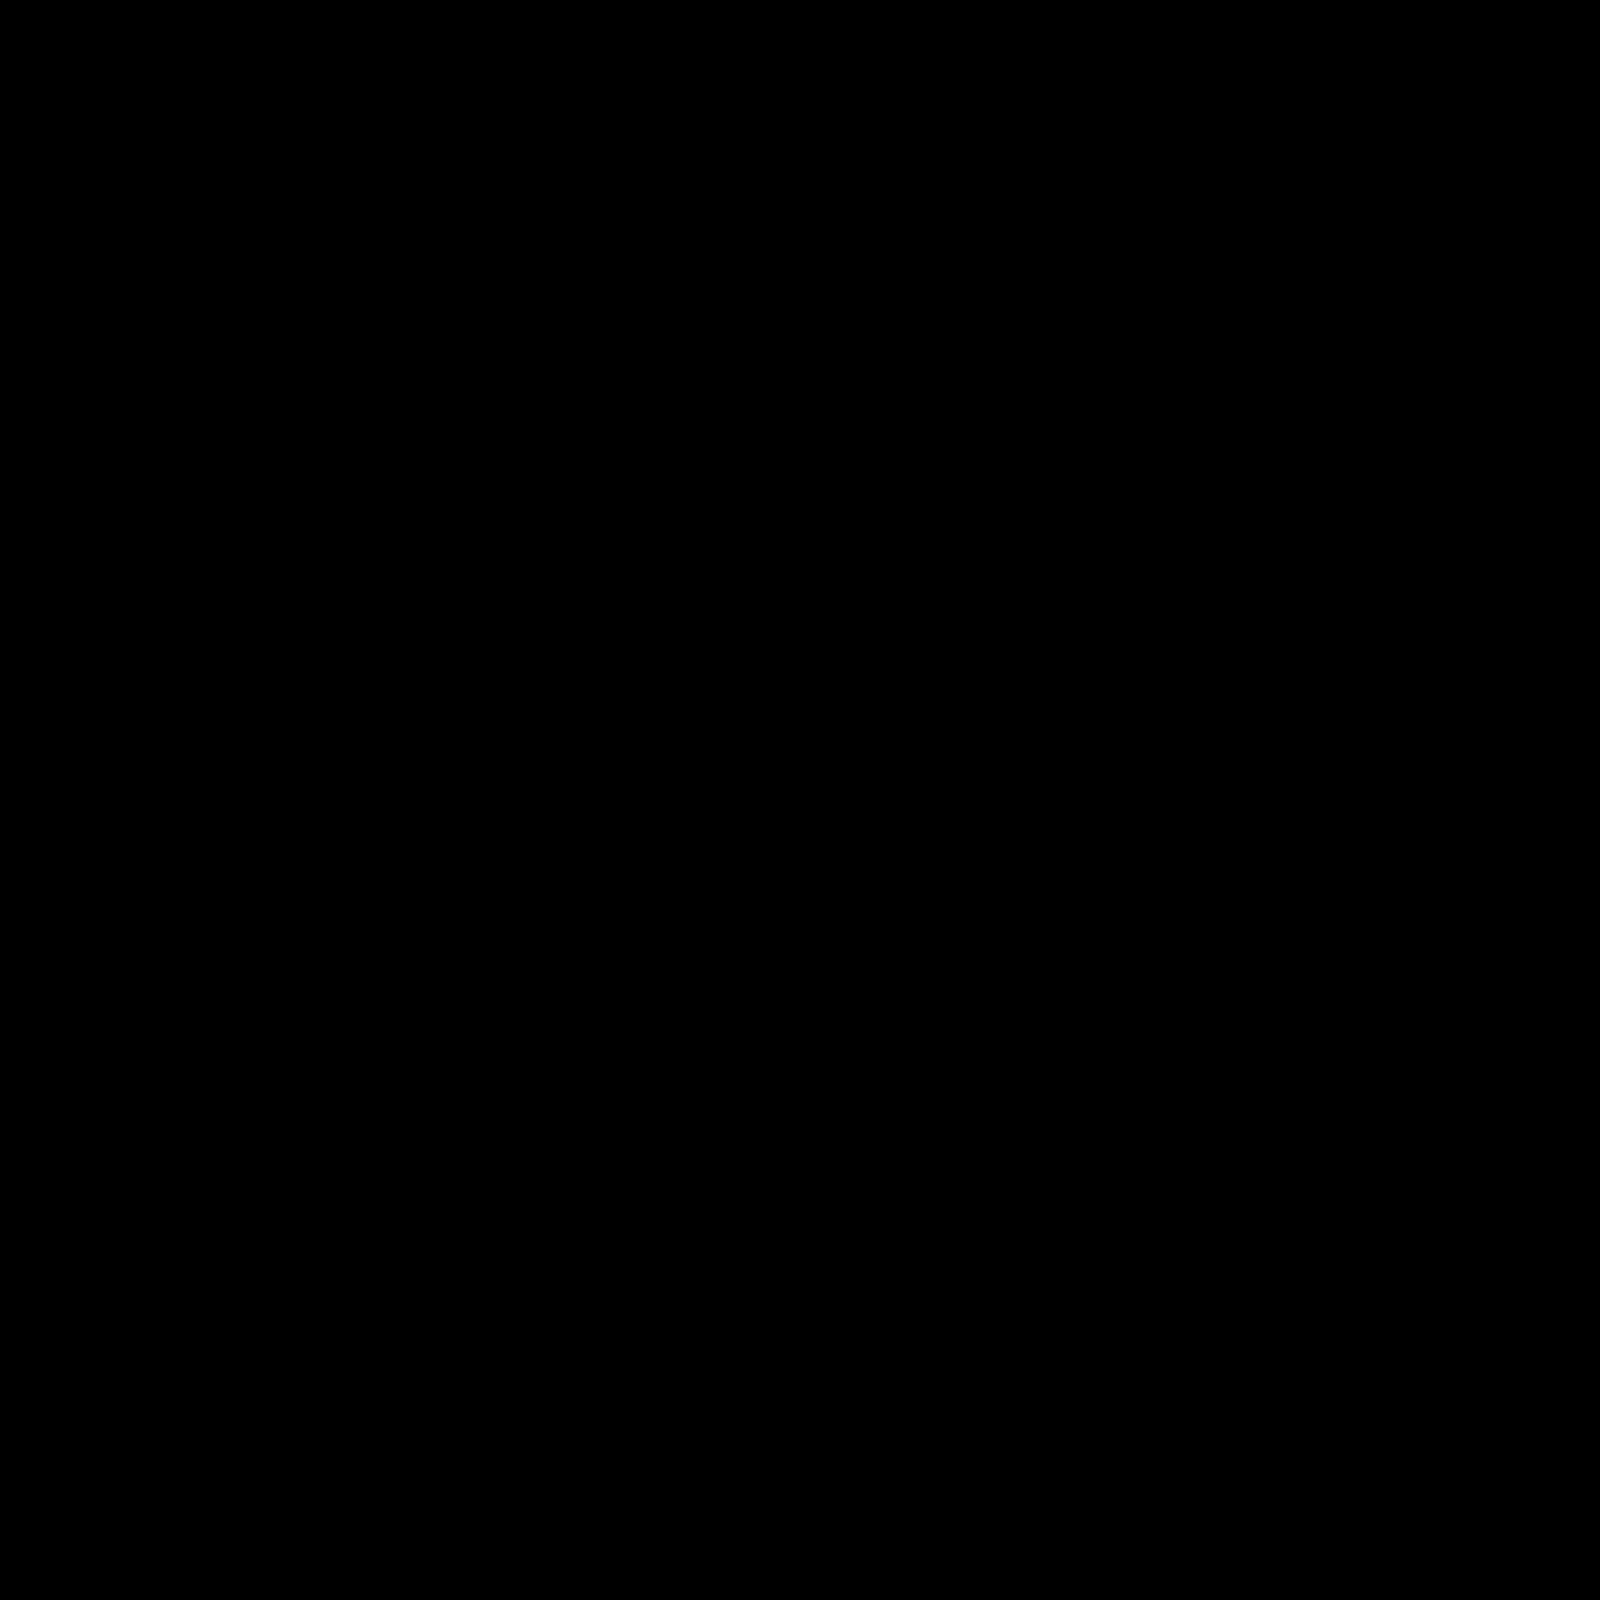 Apple cmyk clipart banner transparent library Apple Logo Vector Download | Alpha Effects banner transparent library